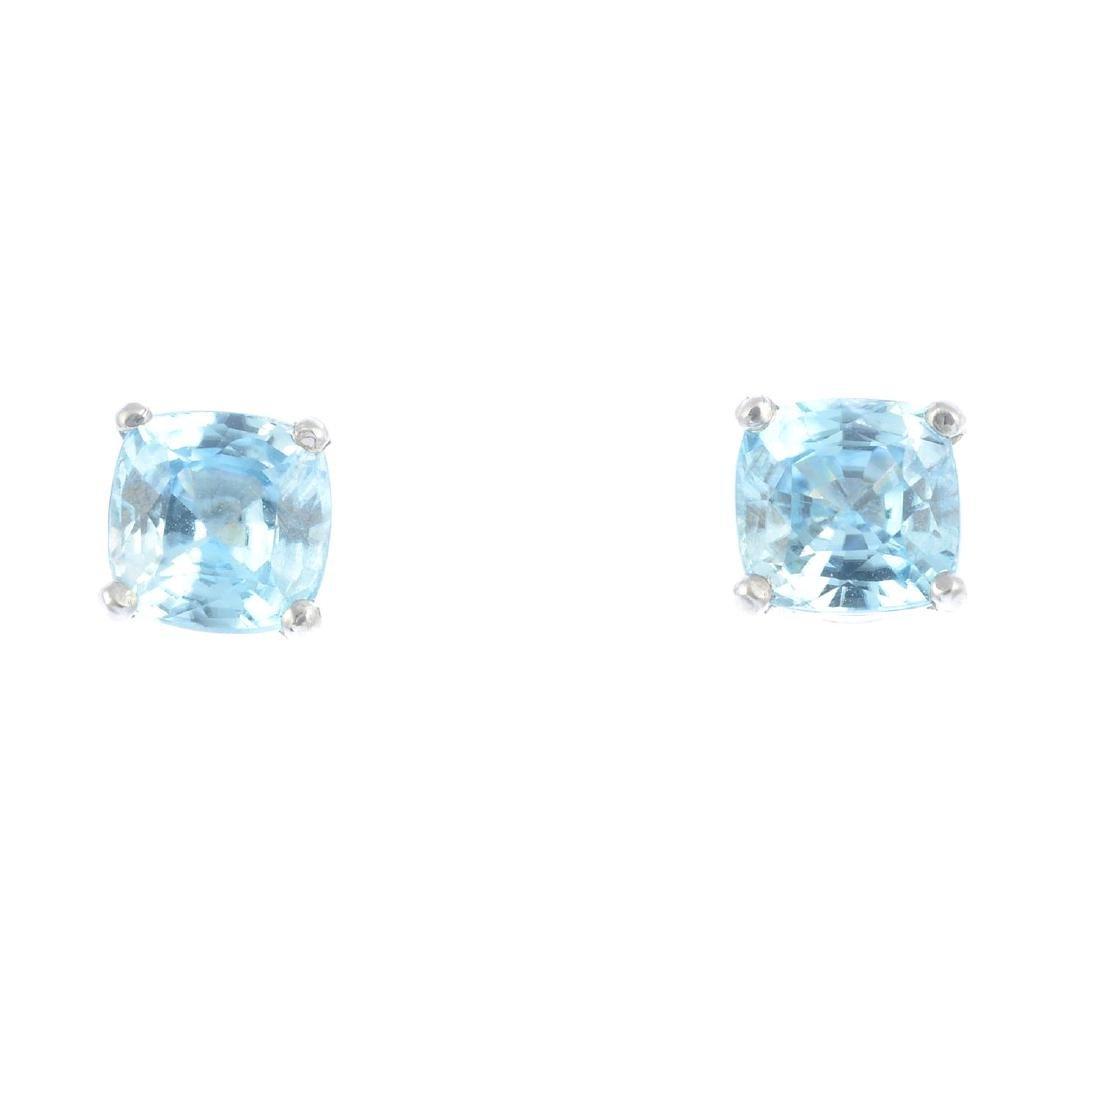 A pair of 18ct gold cushion-shape blue zircon stud